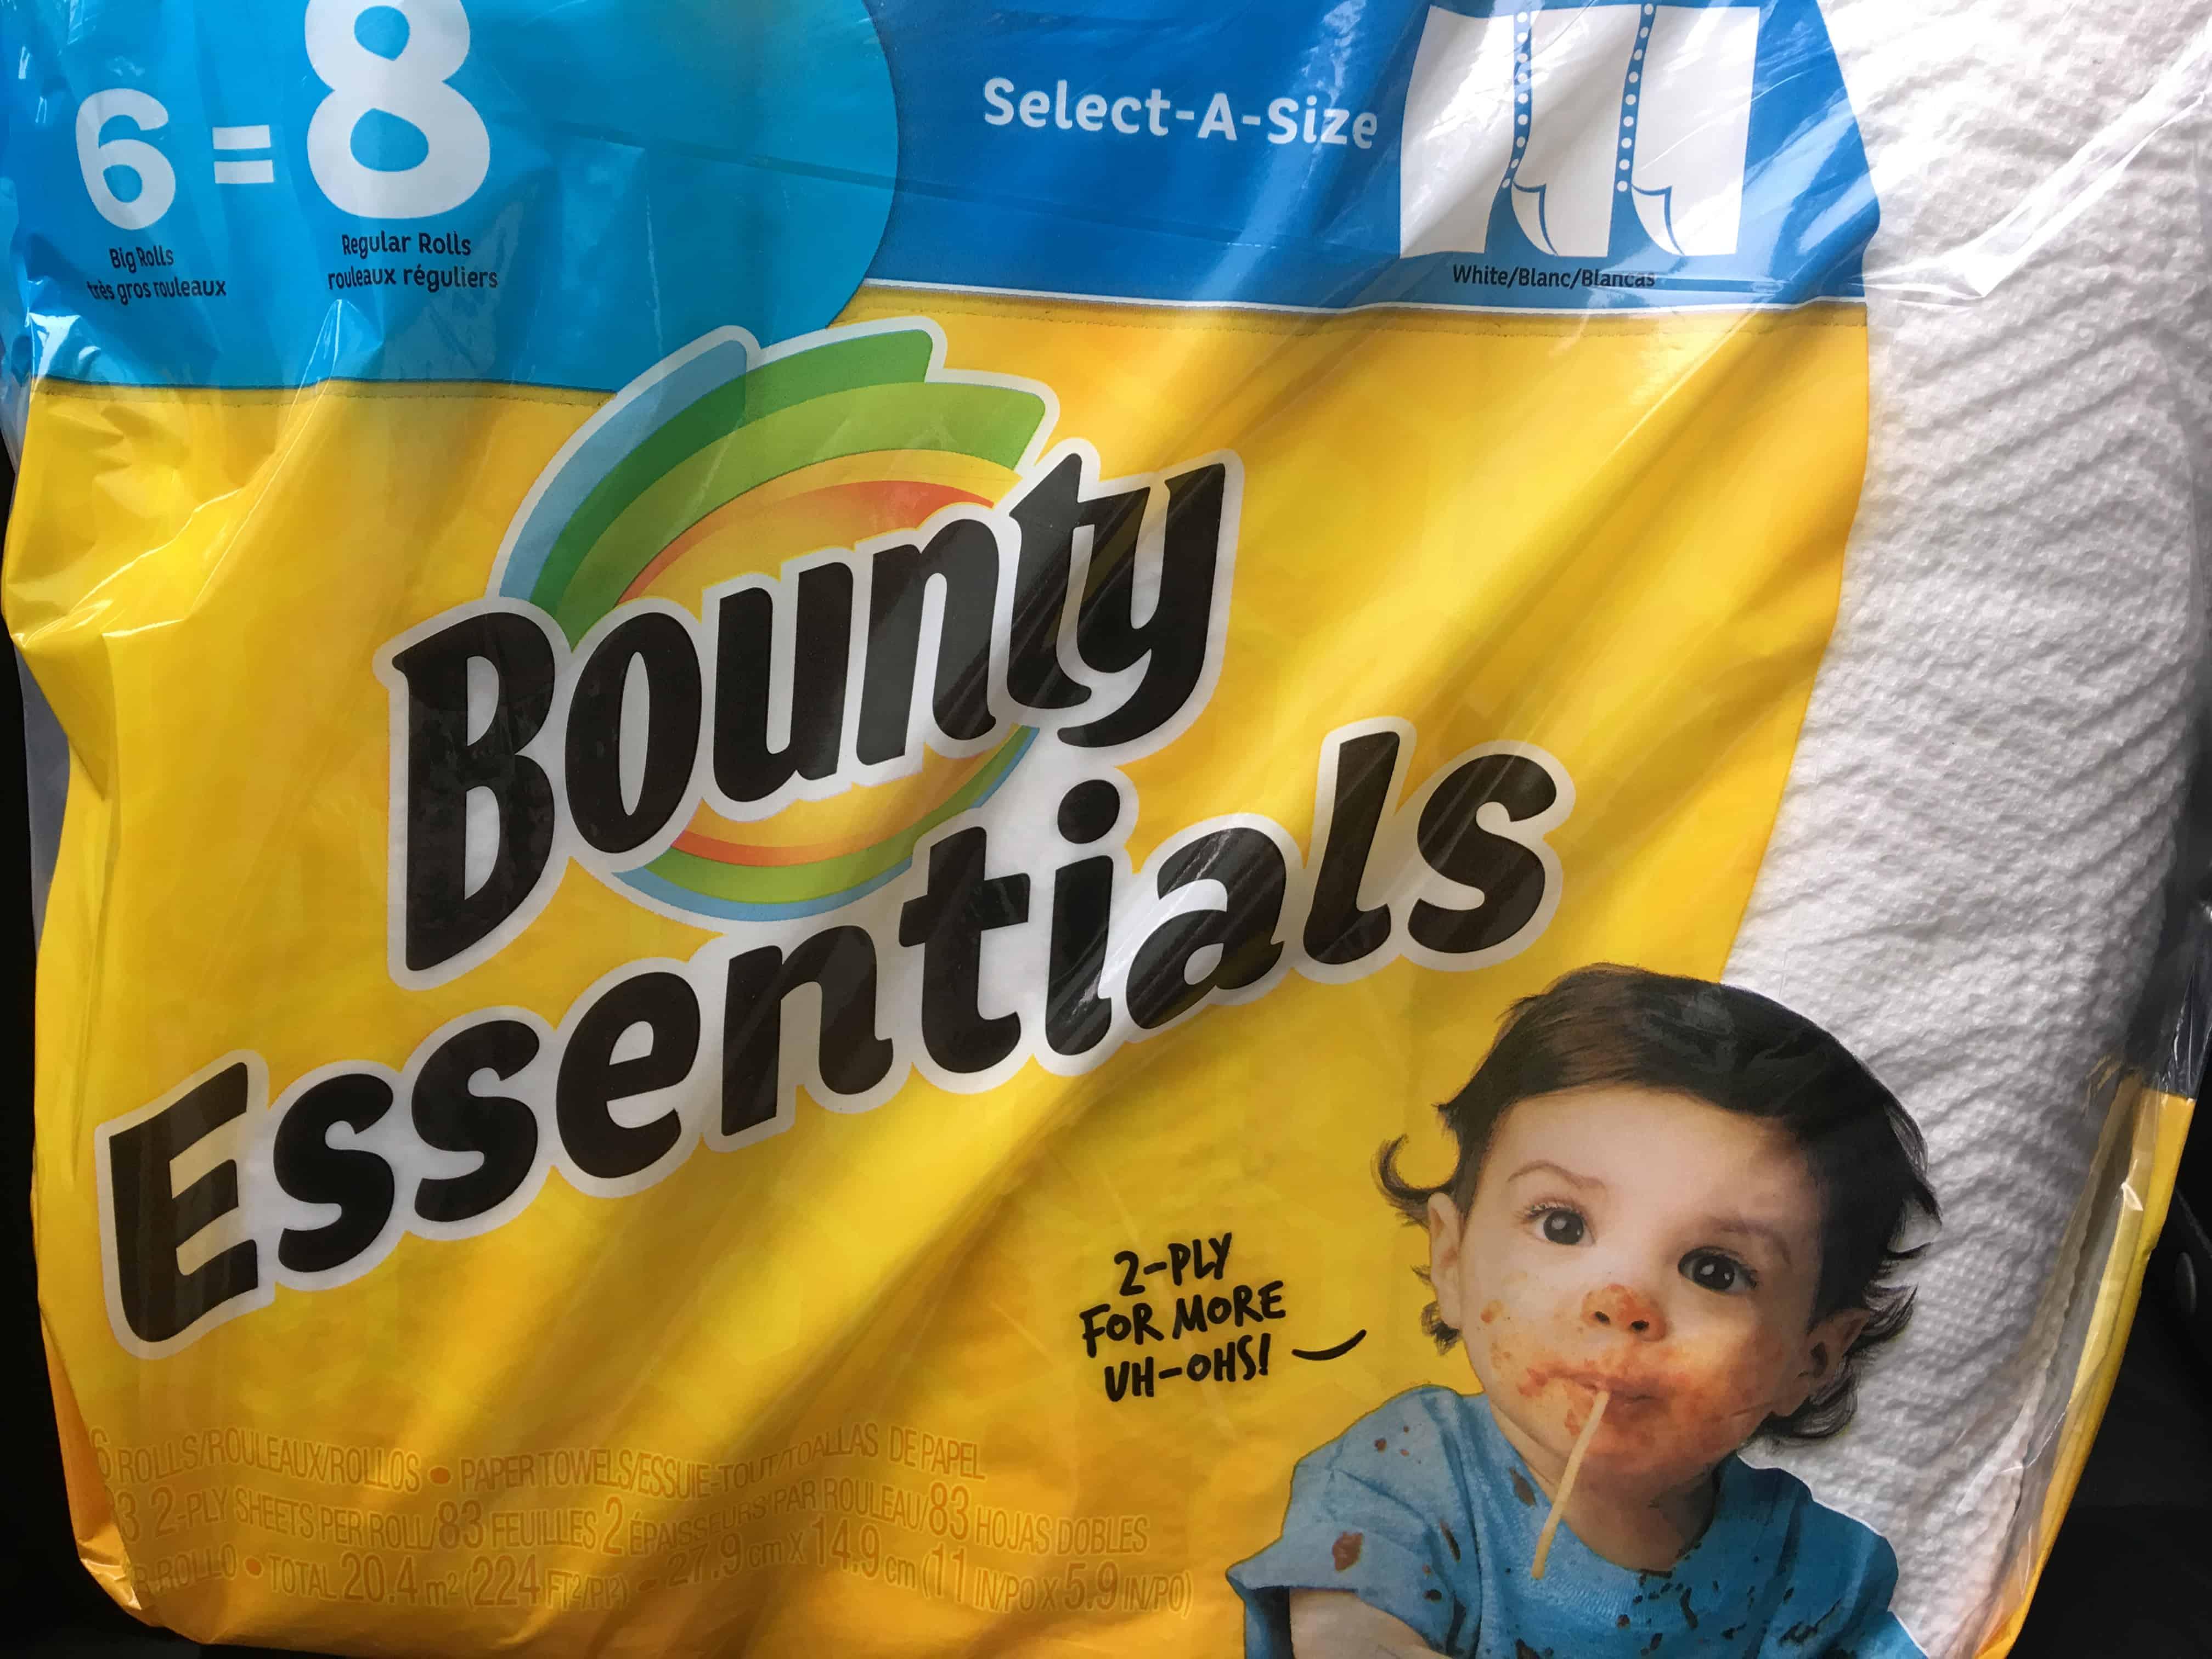 Giant: Bounty Essentials Paper Towels Just $0.33 Per Roll Thru 6/14!